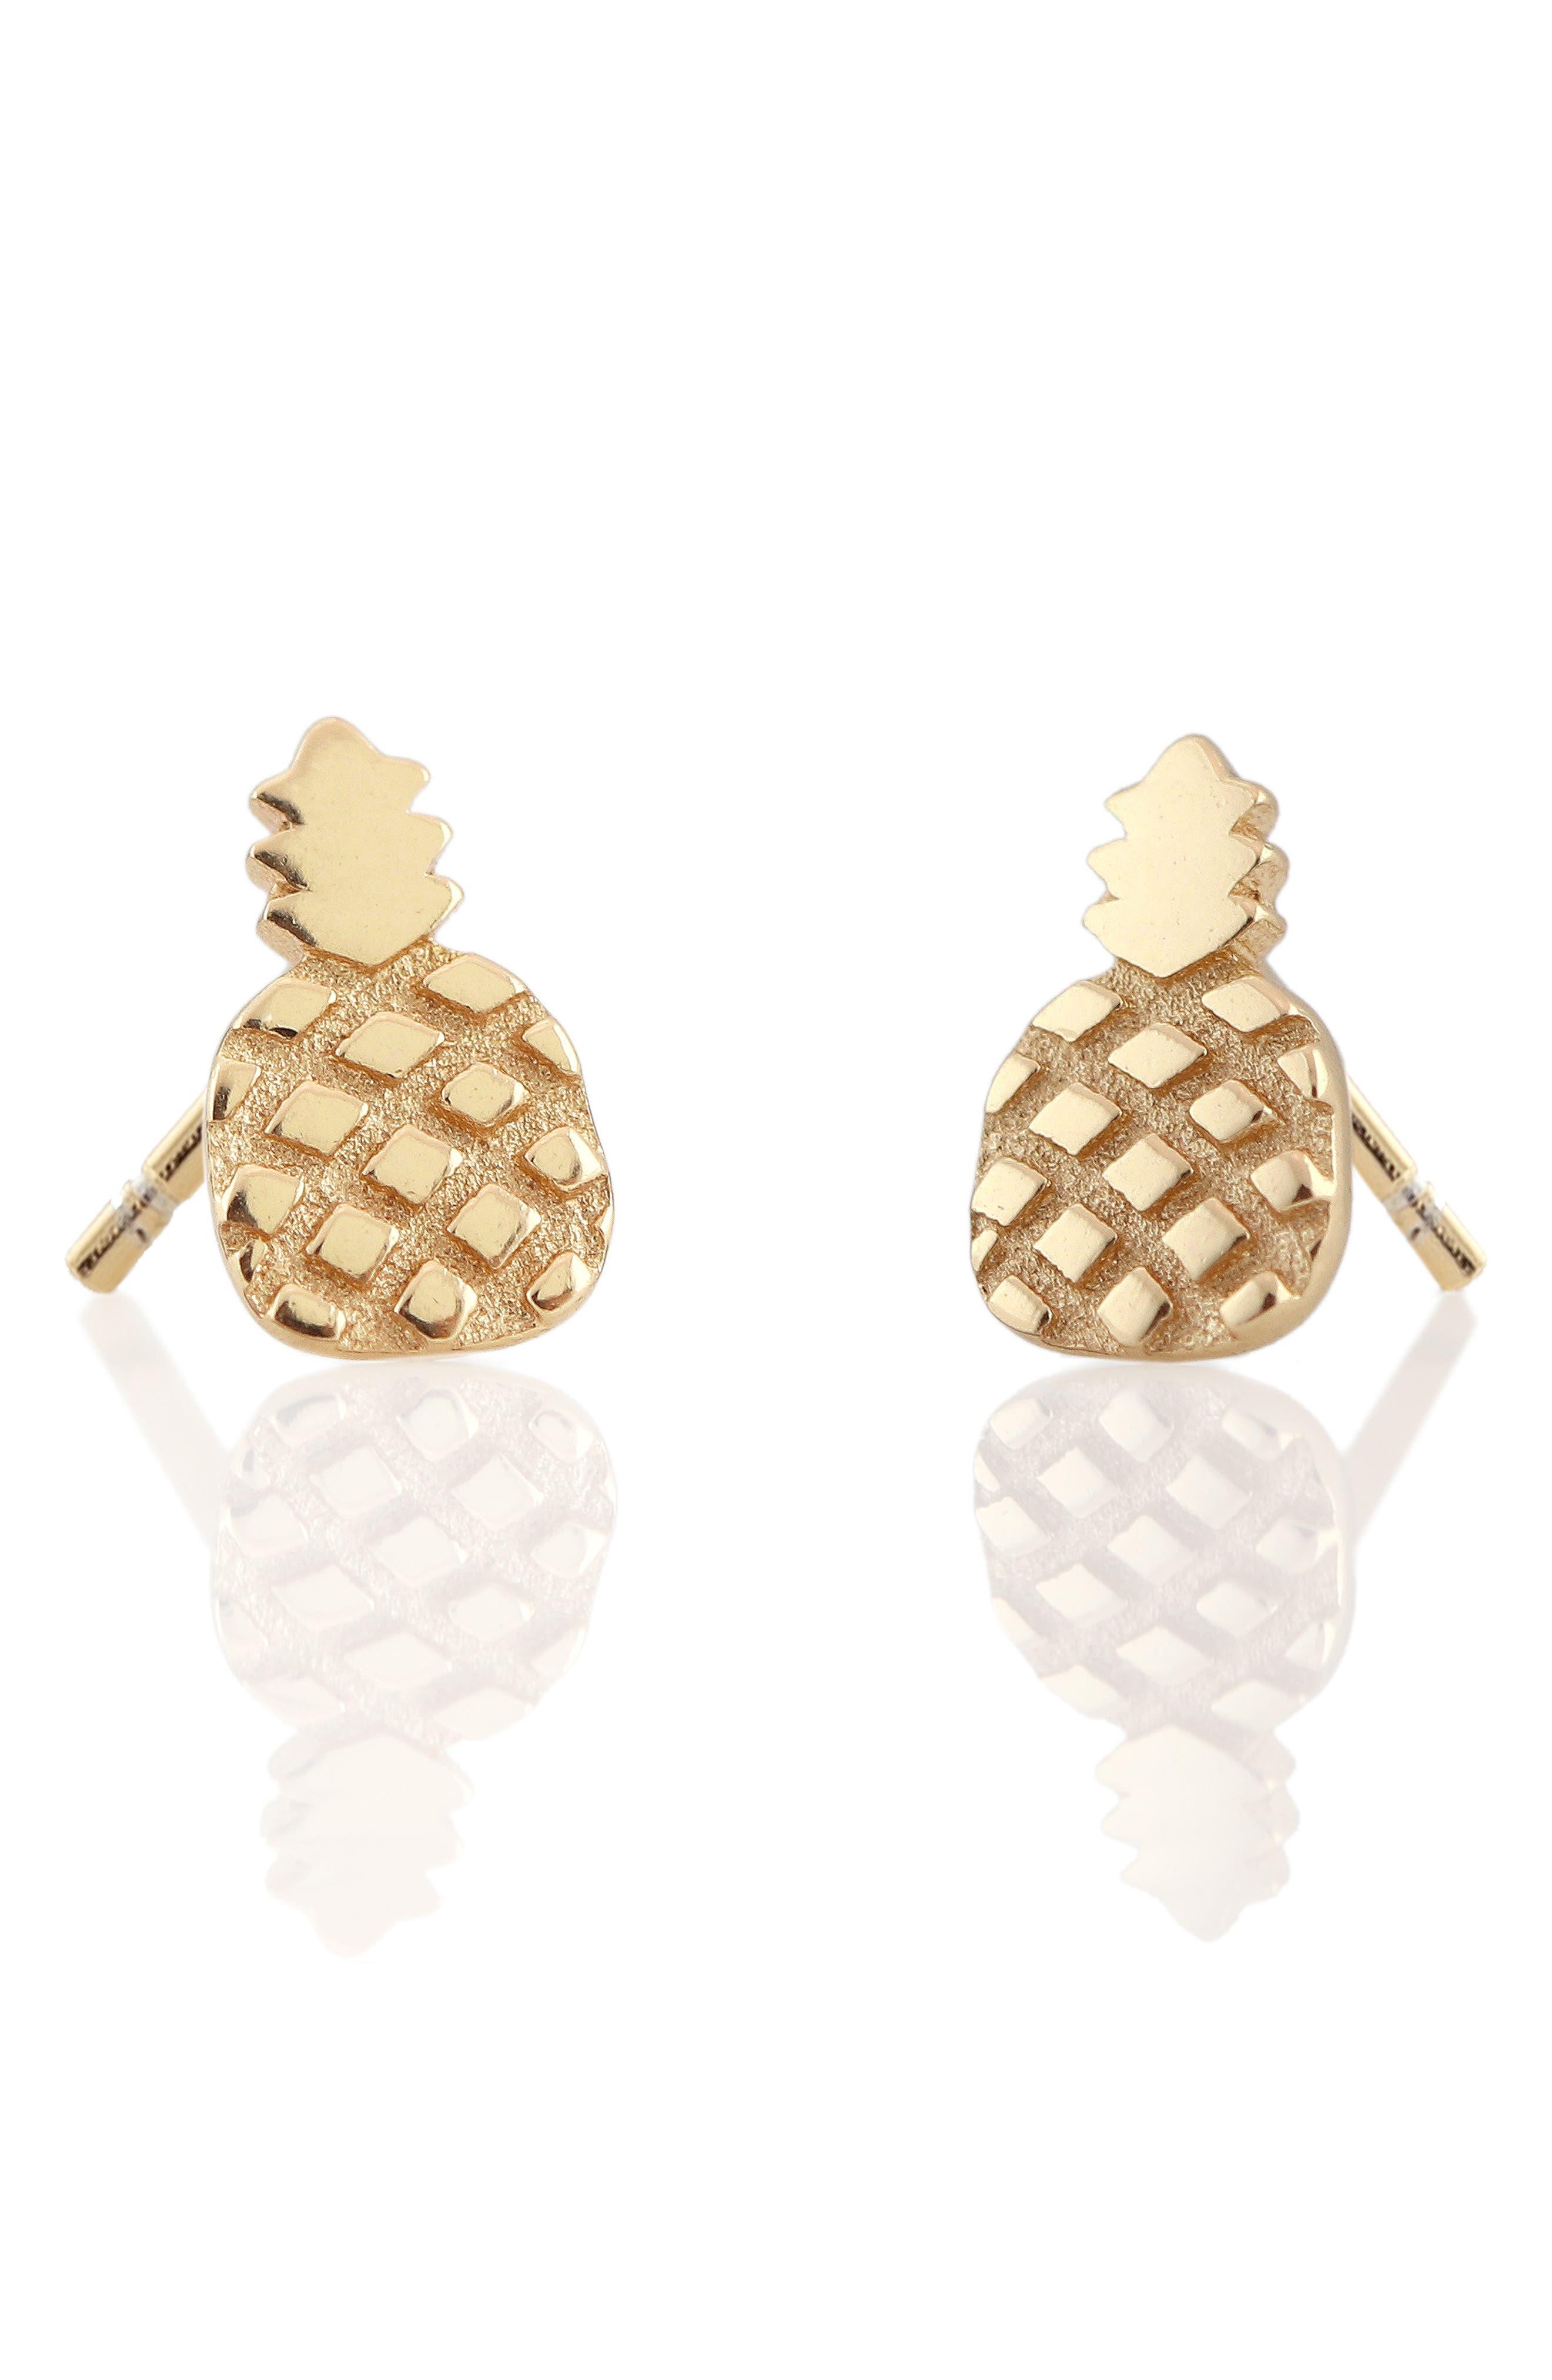 Pineapple Stud Earrings,                             Main thumbnail 1, color,                             Gold